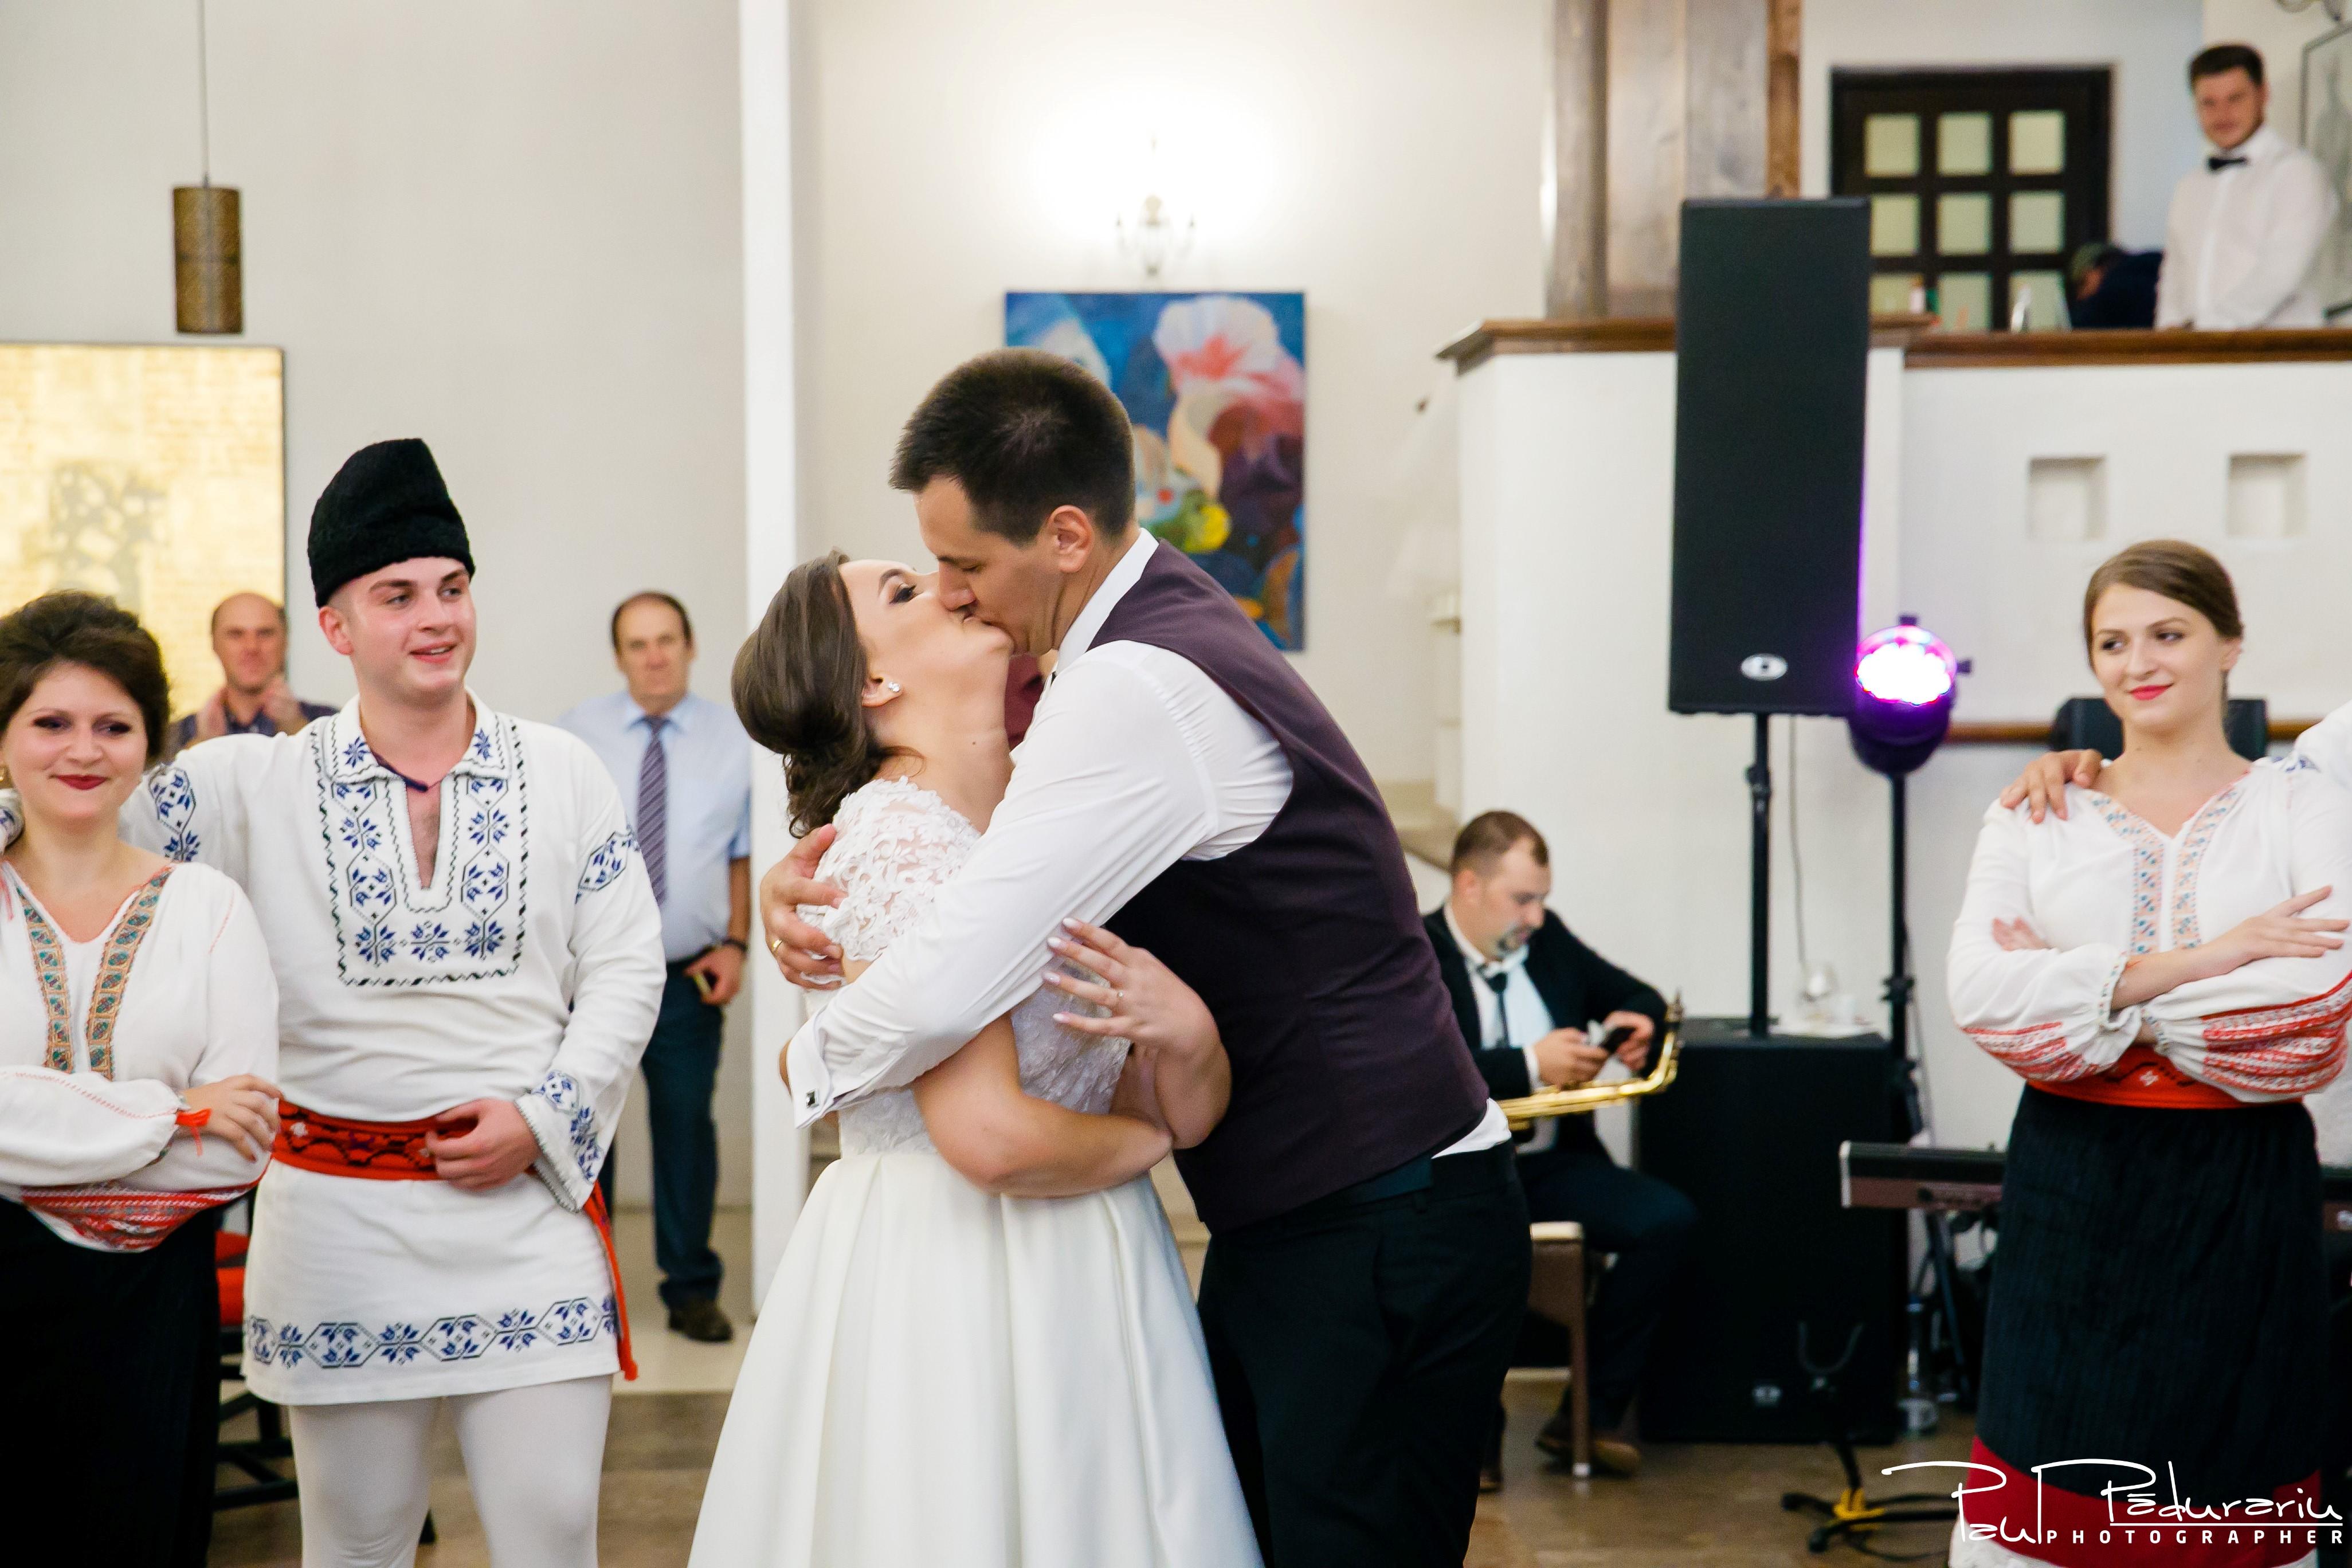 Cristina si Razvan nunta rustica la Bellaria Loja Domneasca petrecere dupa dansul cu ansamblul fotograf profesionist nunta Iasi www.paulpadurariu.ro © 2017 Paul Padurariu